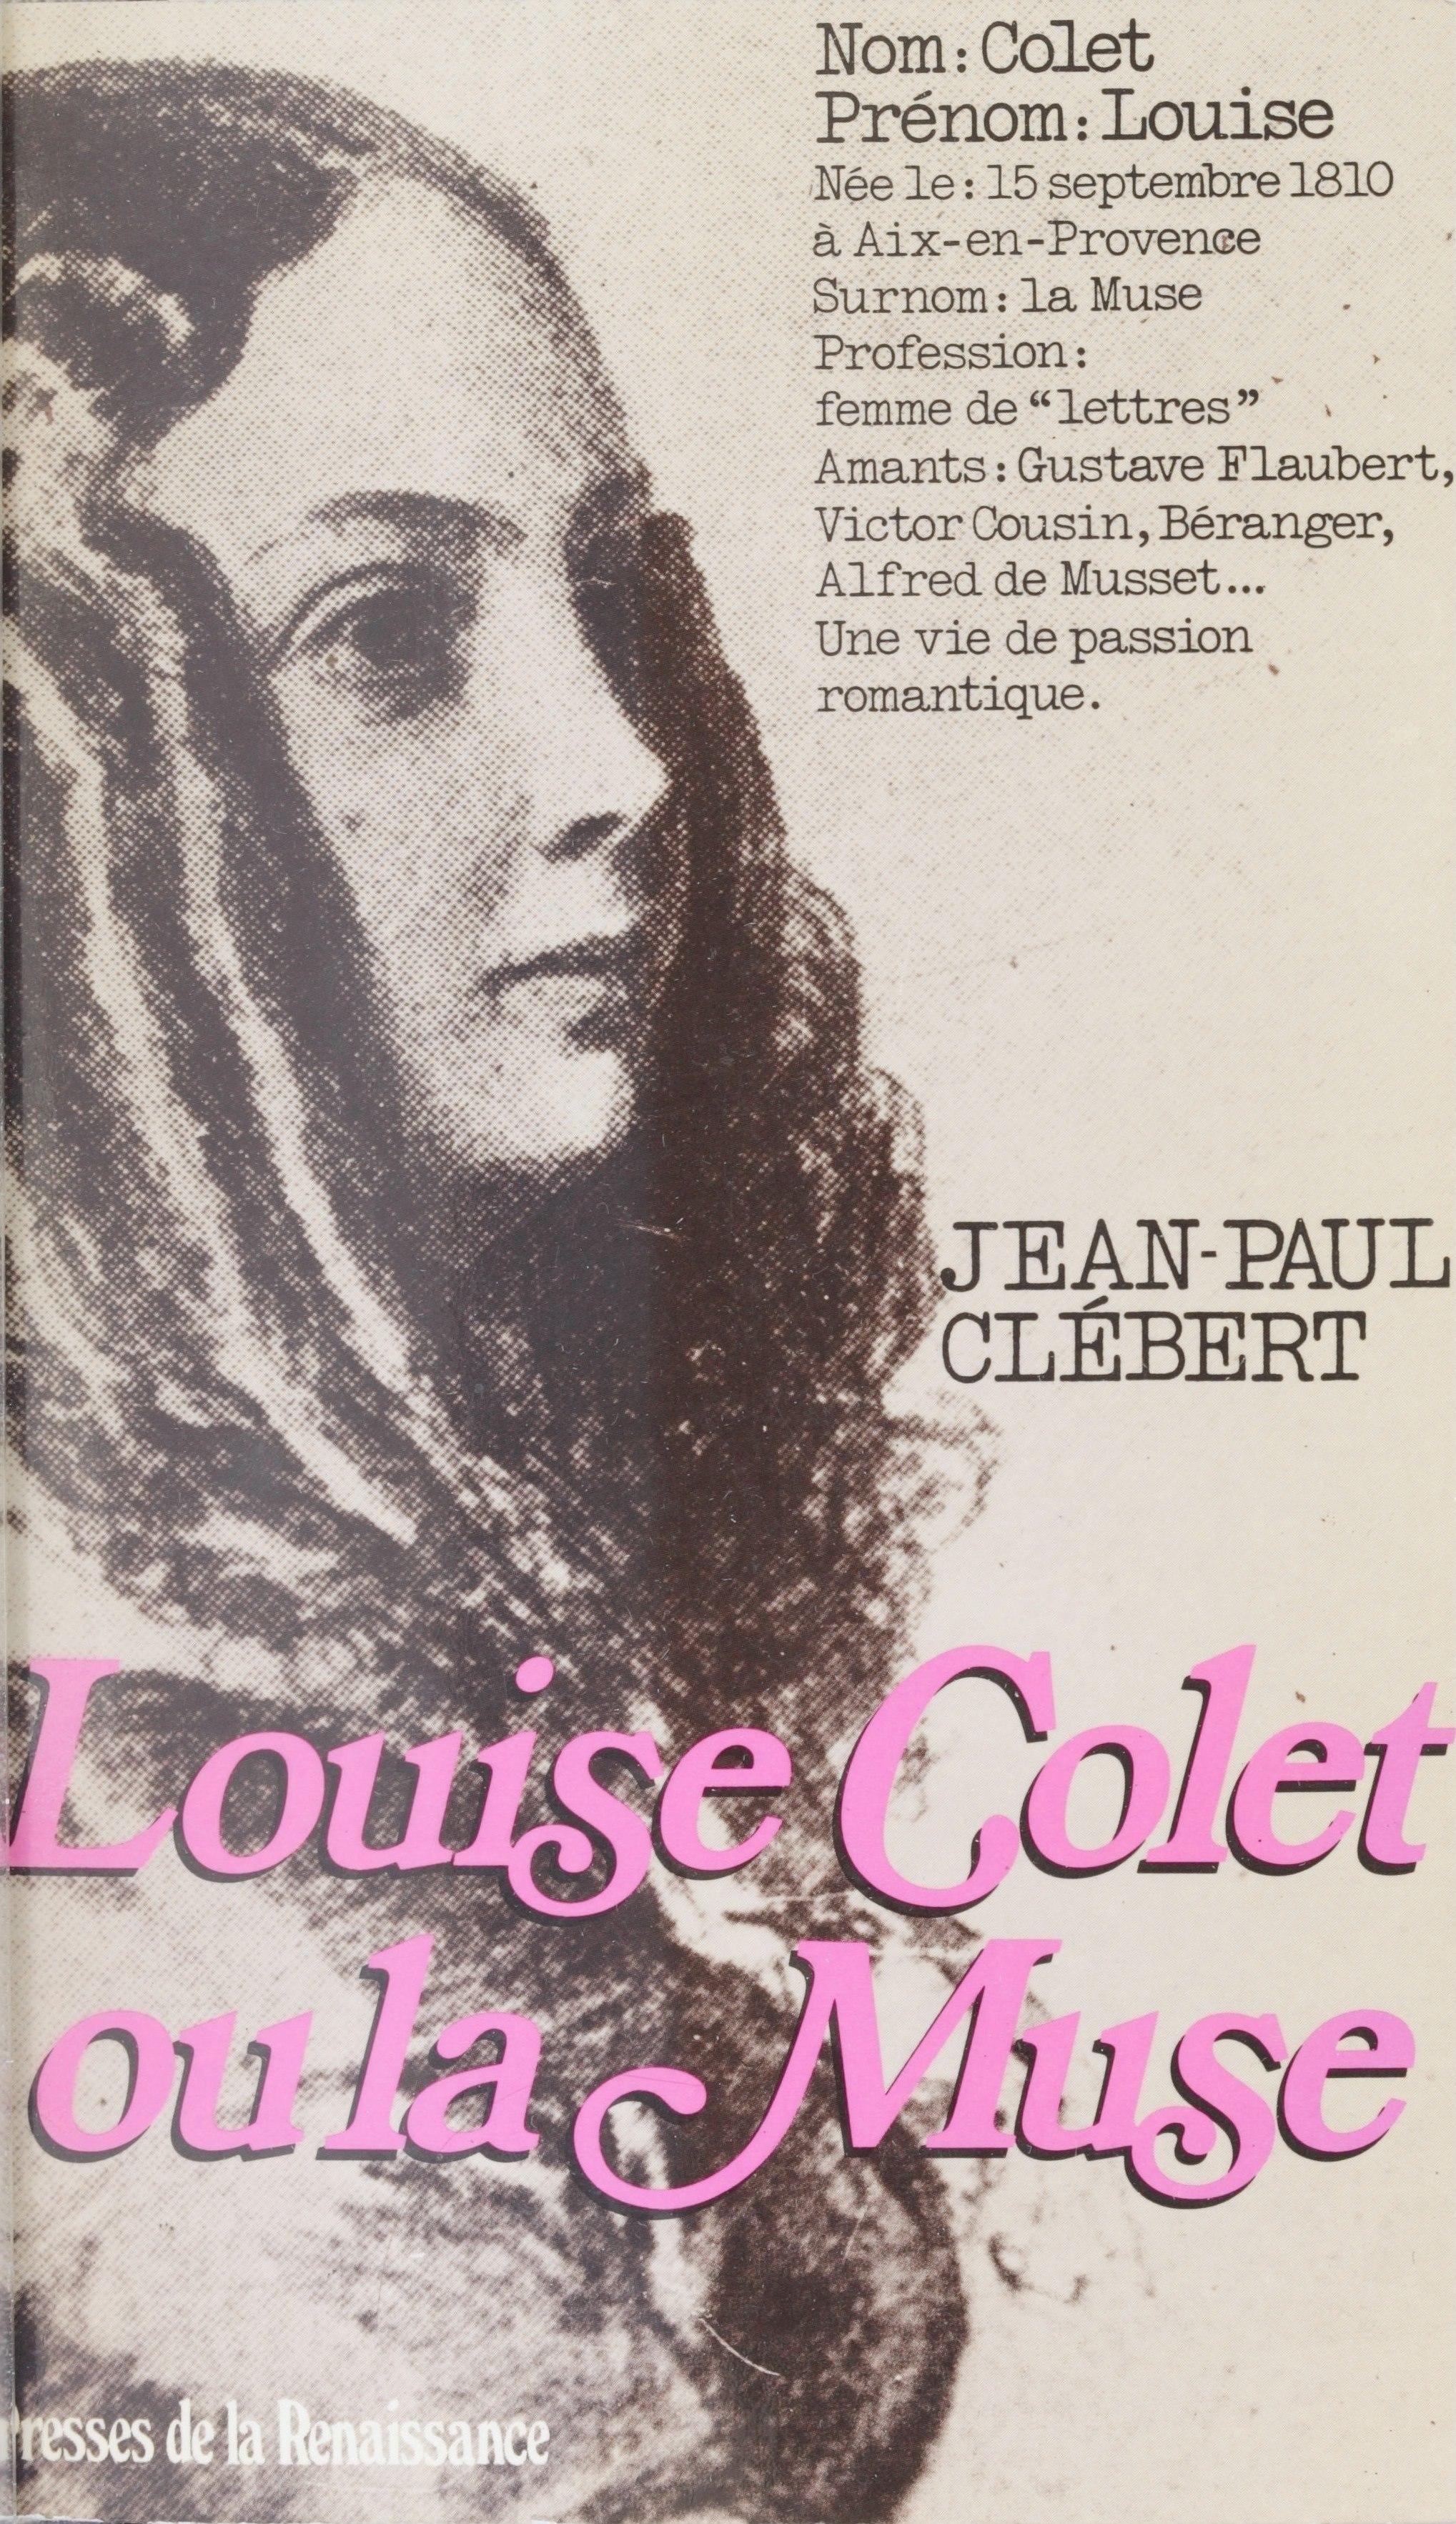 Louise Colet